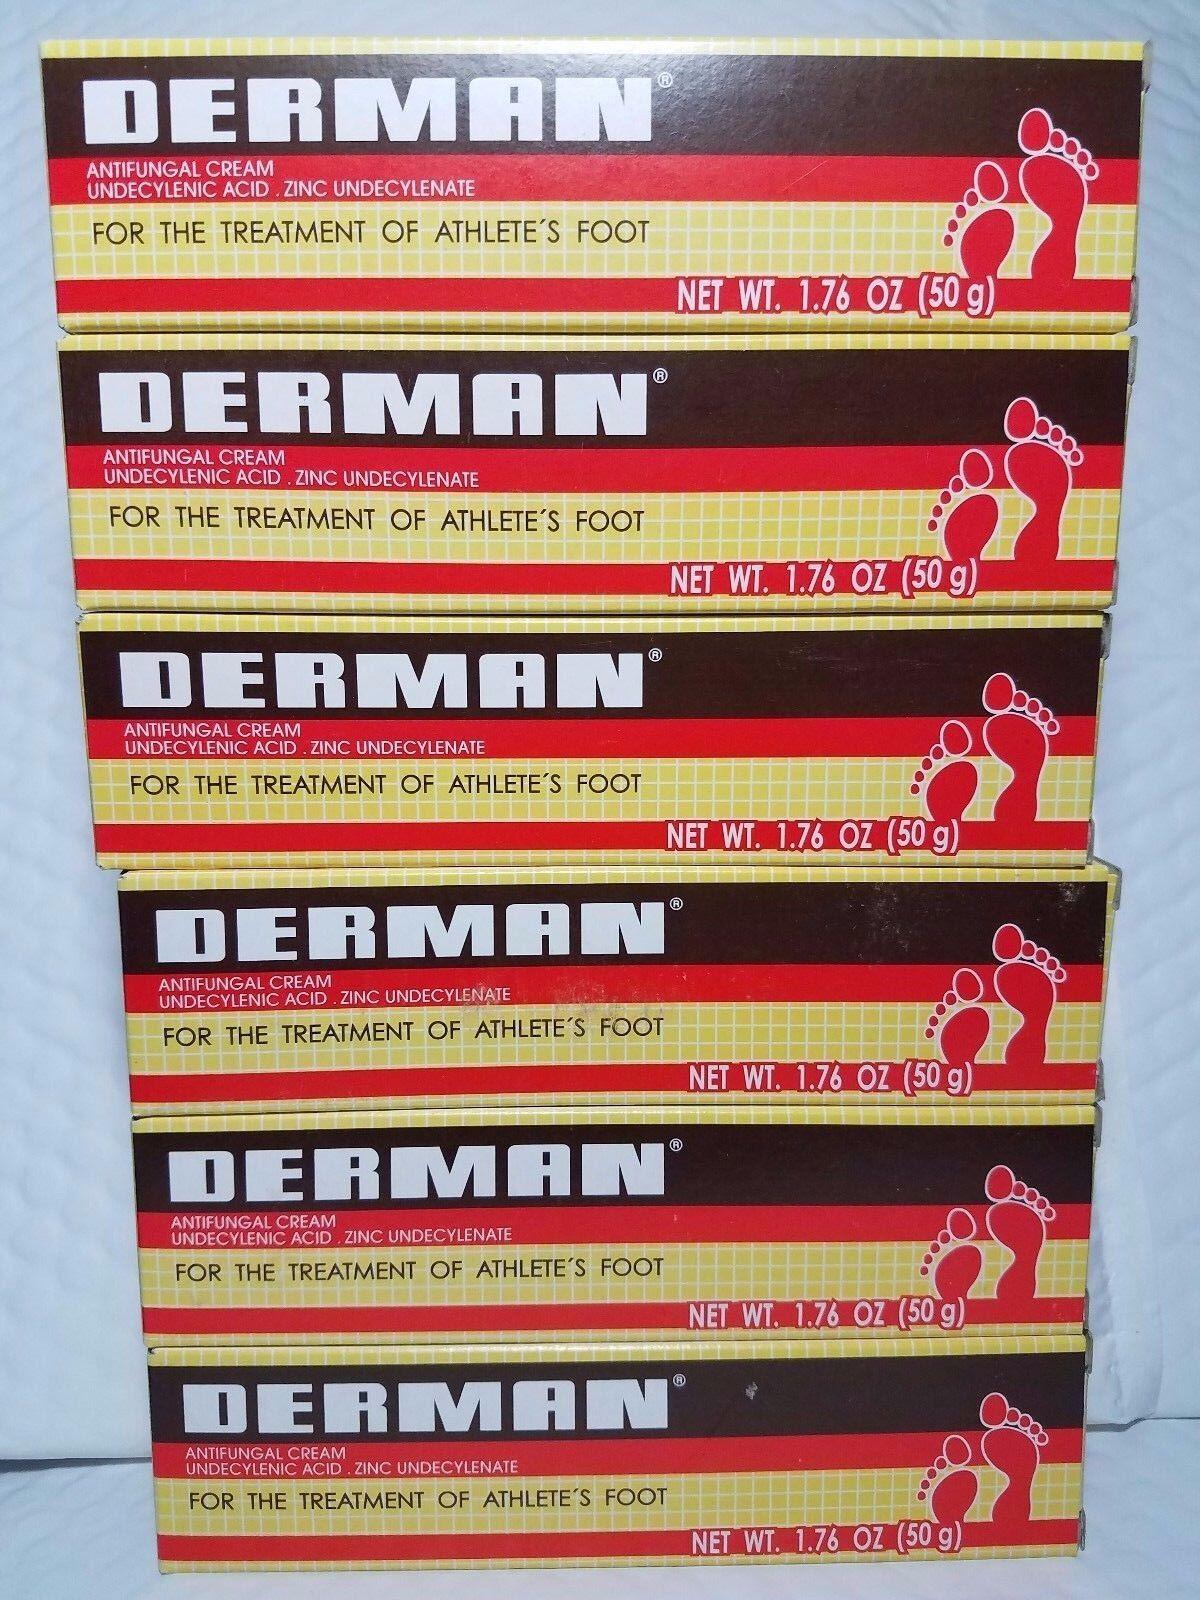 3X Pieces  DERMAN ANTIFUNGAL CREAM  1.76 OZ EACH 09/18 UNISE